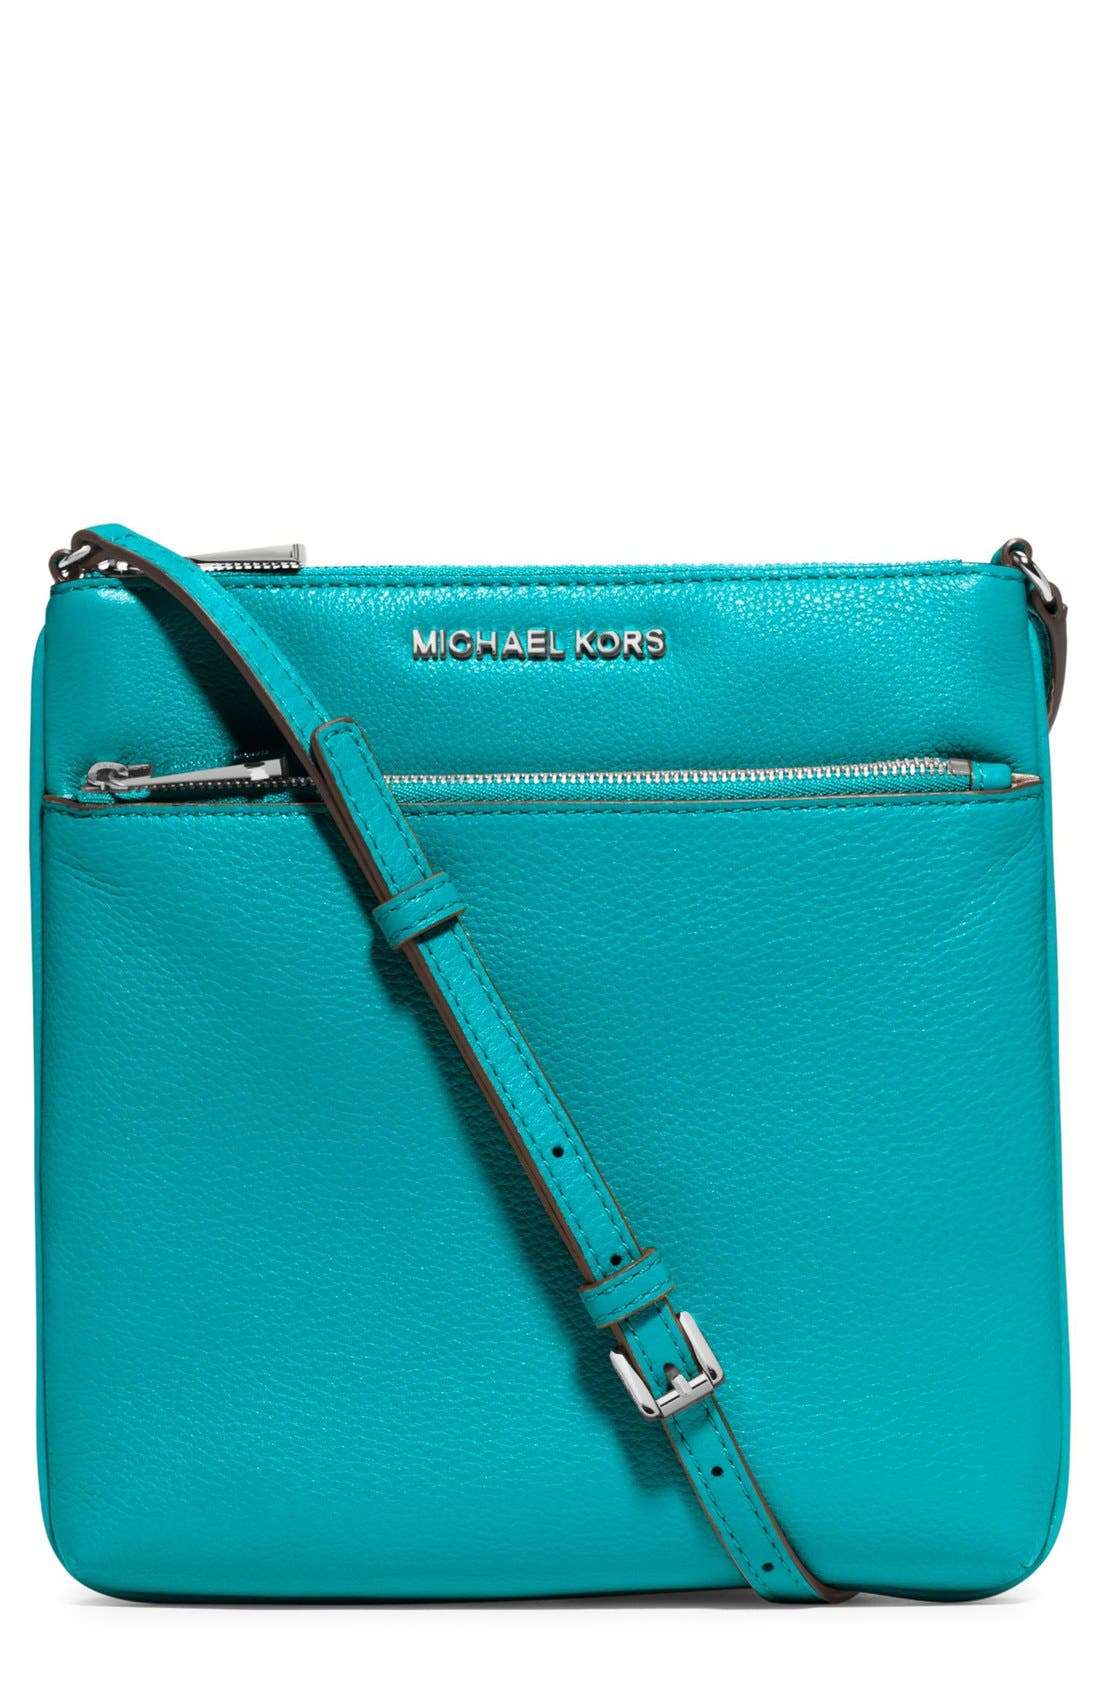 Alternate Image 1 Selected - MICHAEL Michael Kors 'Small Riley' Leather Crossbody Bag